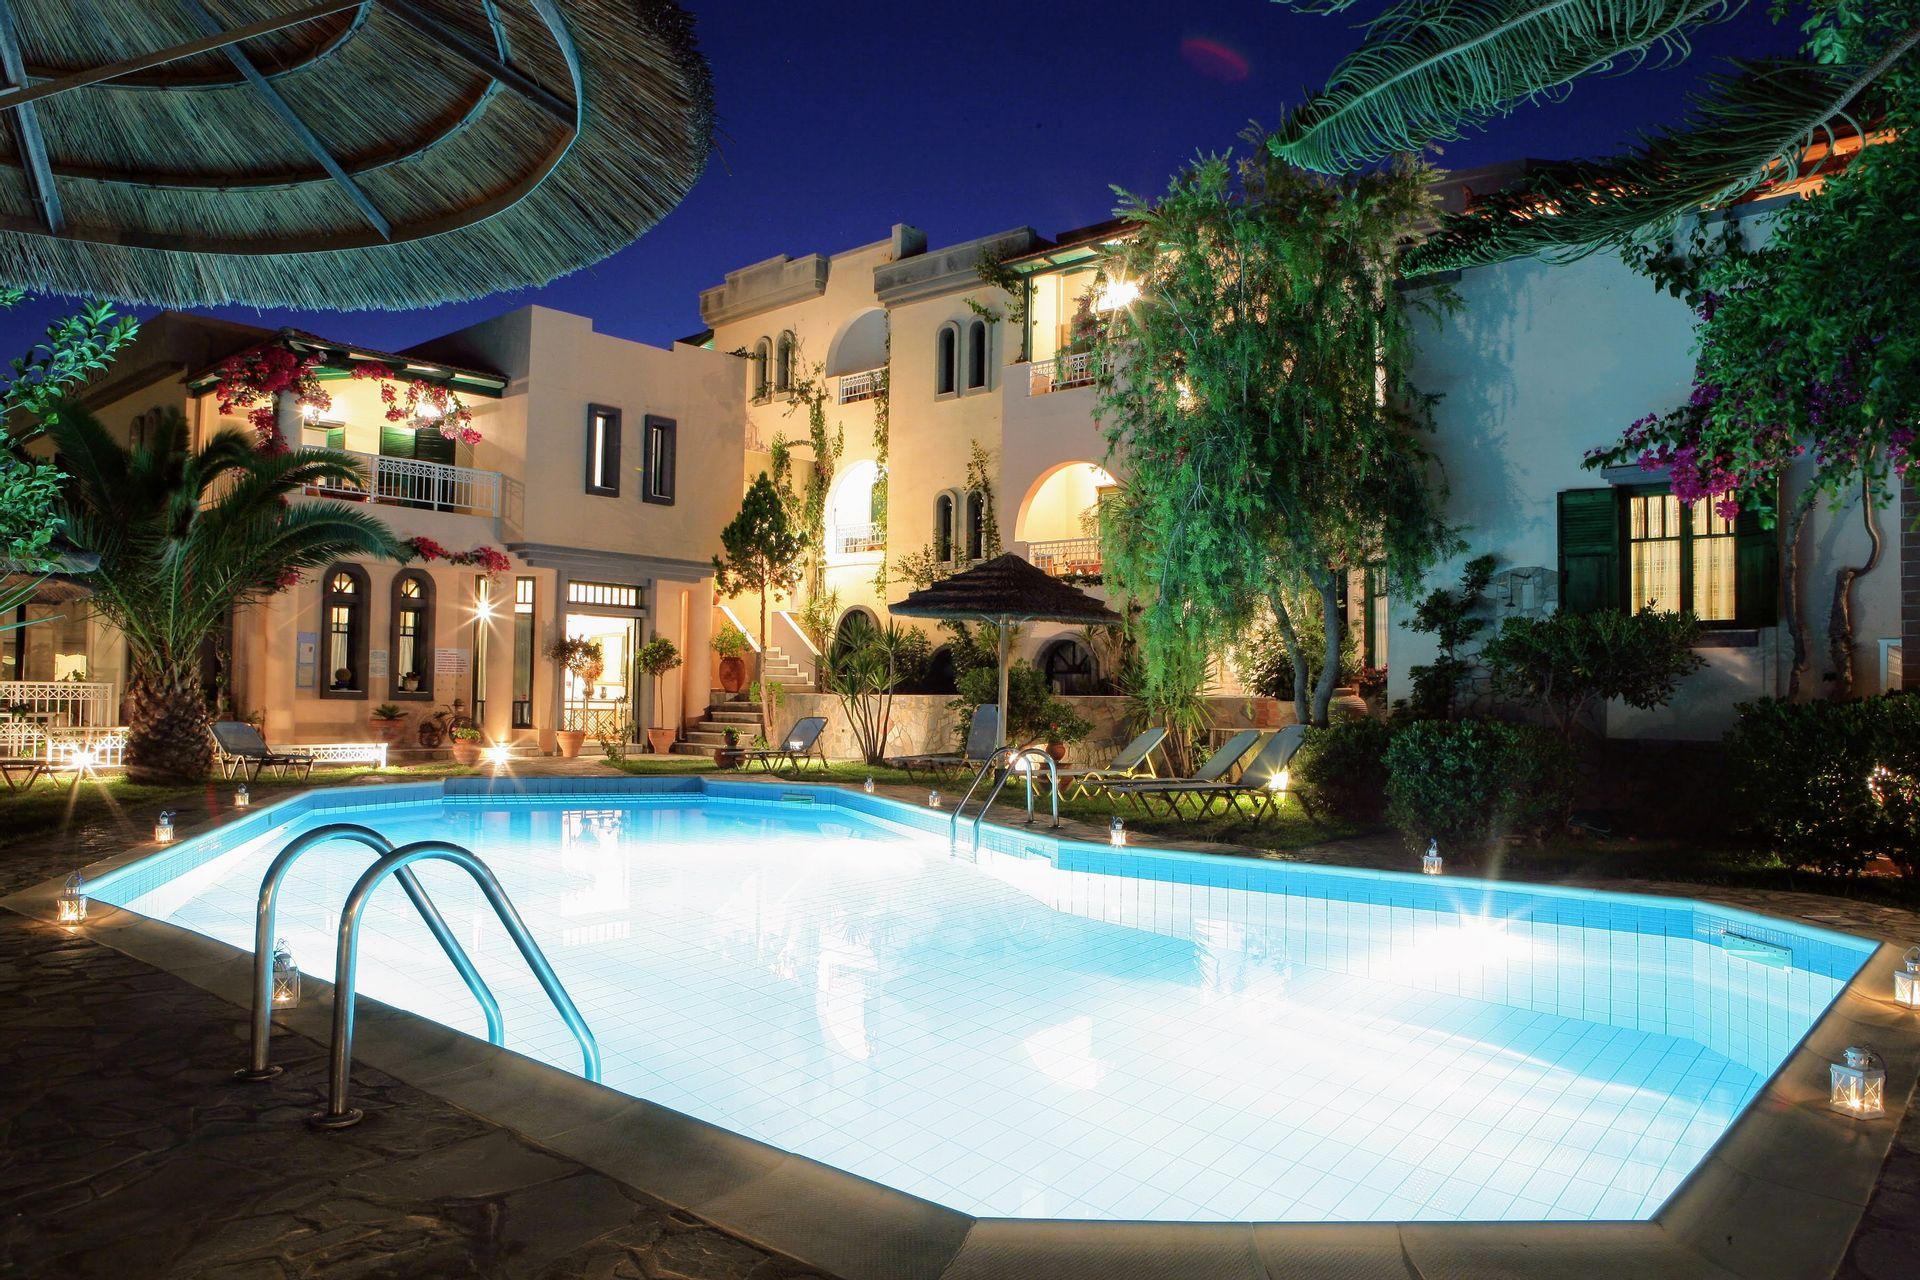 4* Aquarius Exclusive Apartments - Ηράκλειο, Κρήτη ✦ 2 Ημέρες (1 Διανυκτέρευση) ✦ 2 άτομα + 1 παιδί έως 6 ετών ✦ Πρωινό ✦ 01/07/2021 έως 31/08/2021 ✦ Μπροστά στην παραλία!